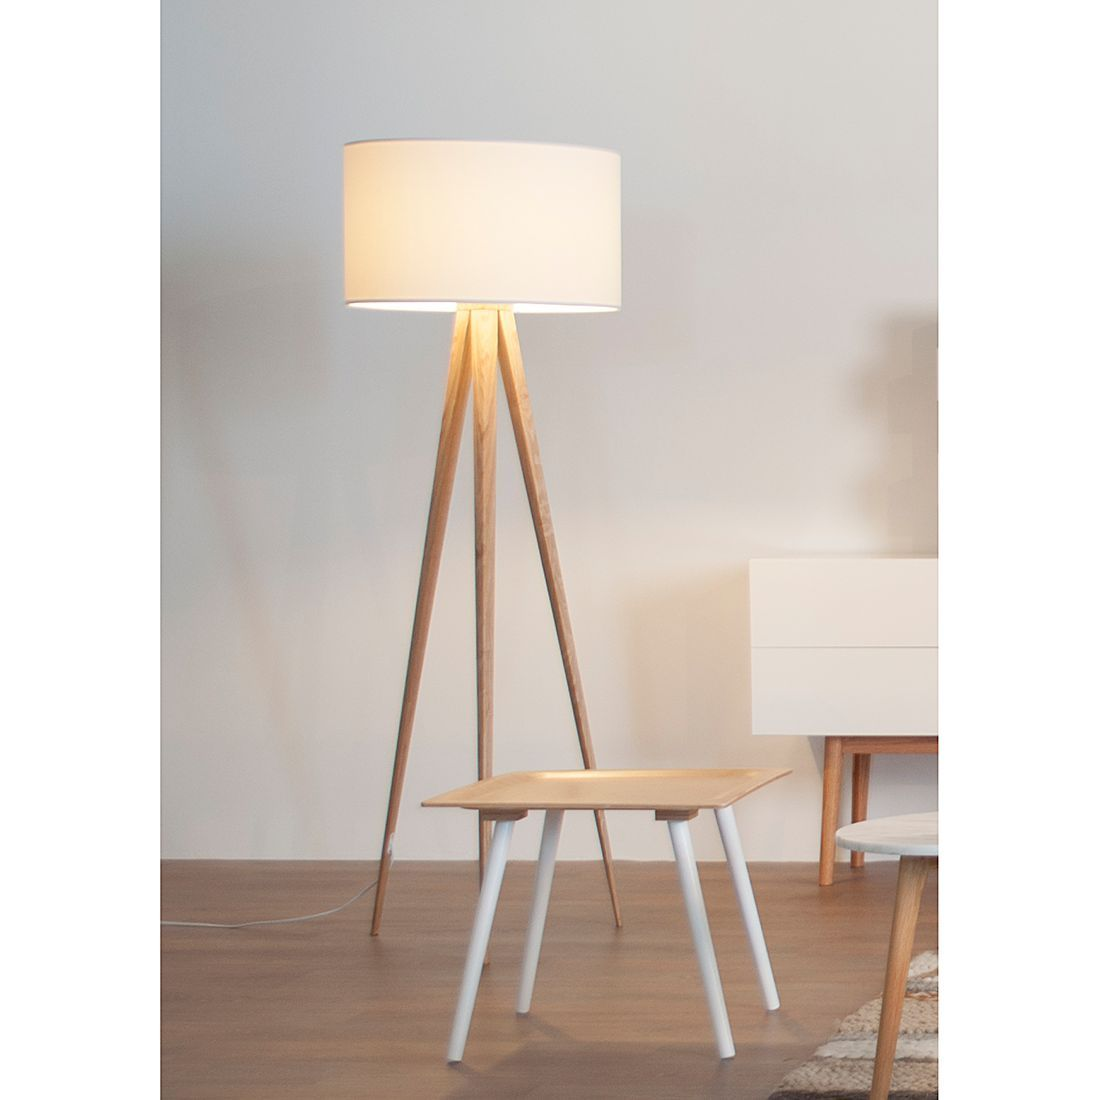 Stehleuchte TRIPOD Wood - 1-flammig - Weiß | Lighting - Iluminacion ...